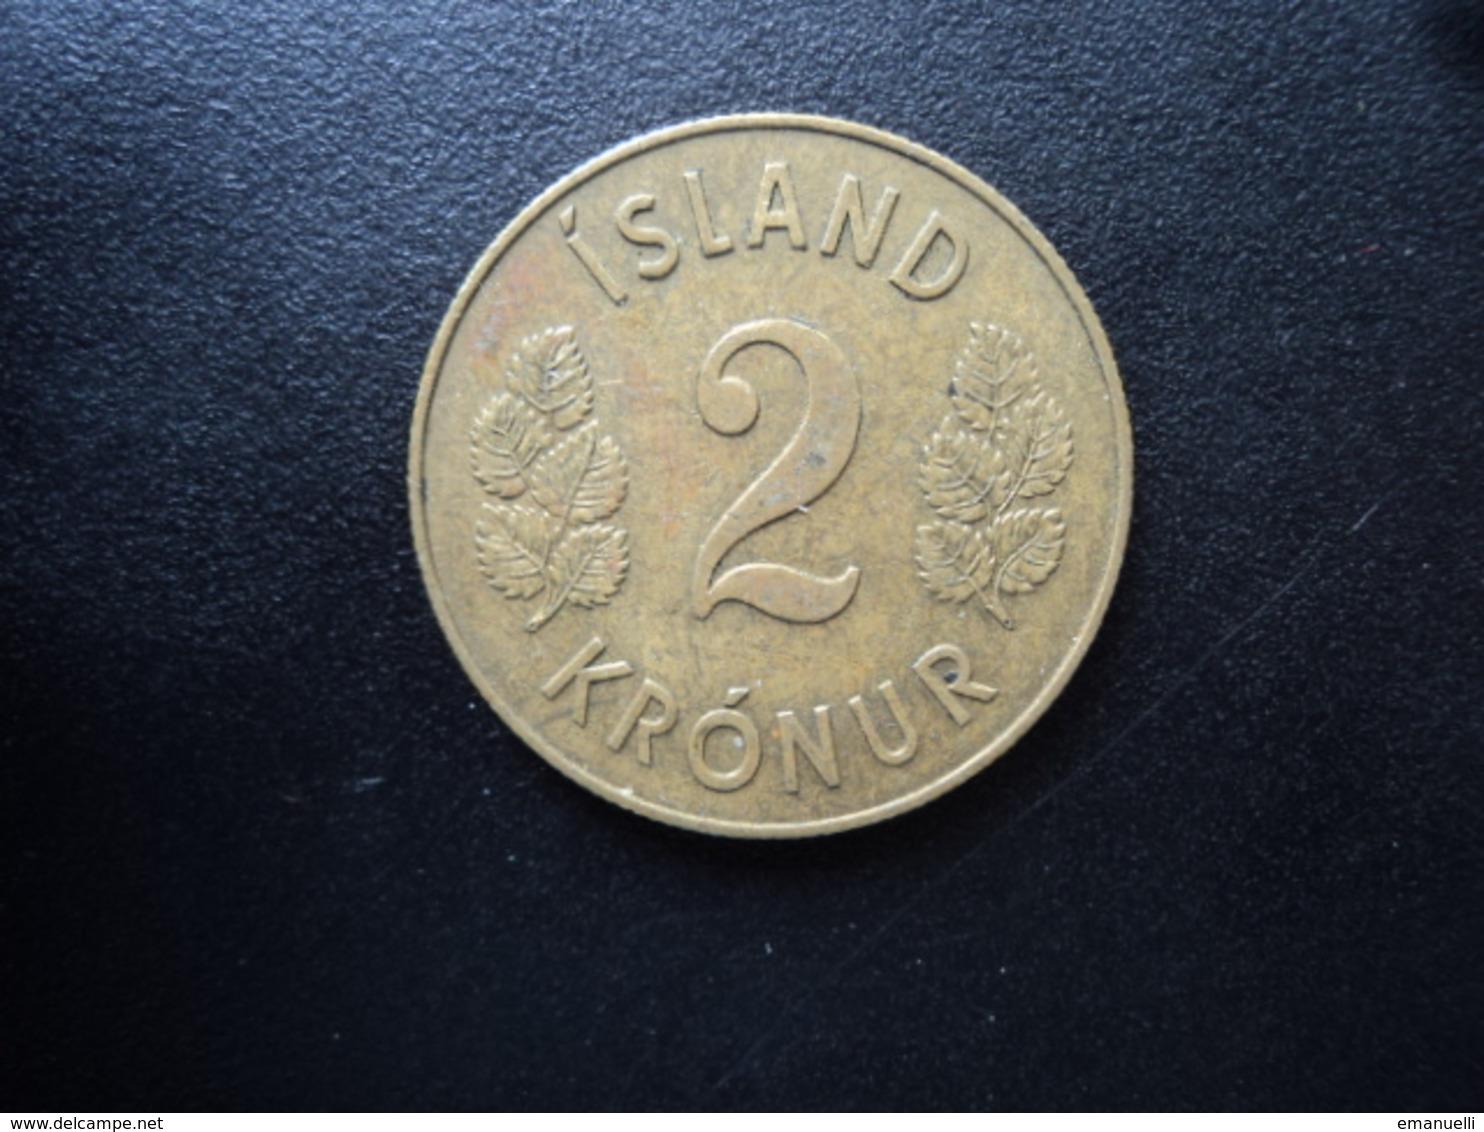 ISLANDE : 2 KRONUR   1958    KM 13a1     SUP - Islandia